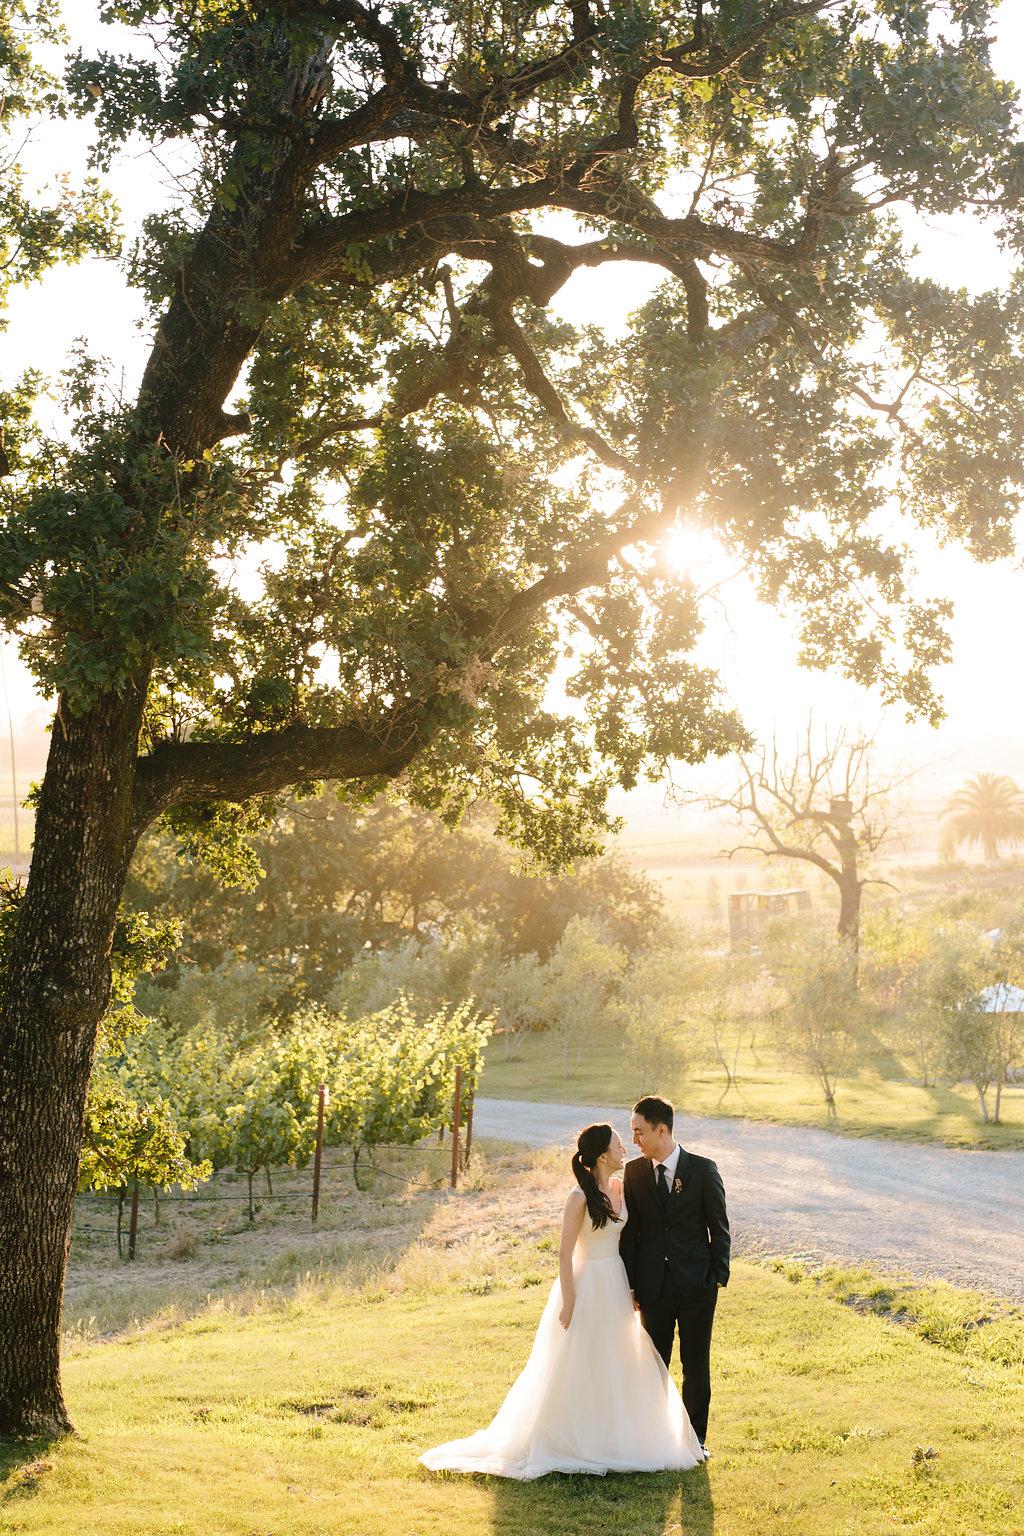 Simone-Anne-Wan-Mariola-Scribe-Winery-Wedding-Sneak-Peek-18.jpg